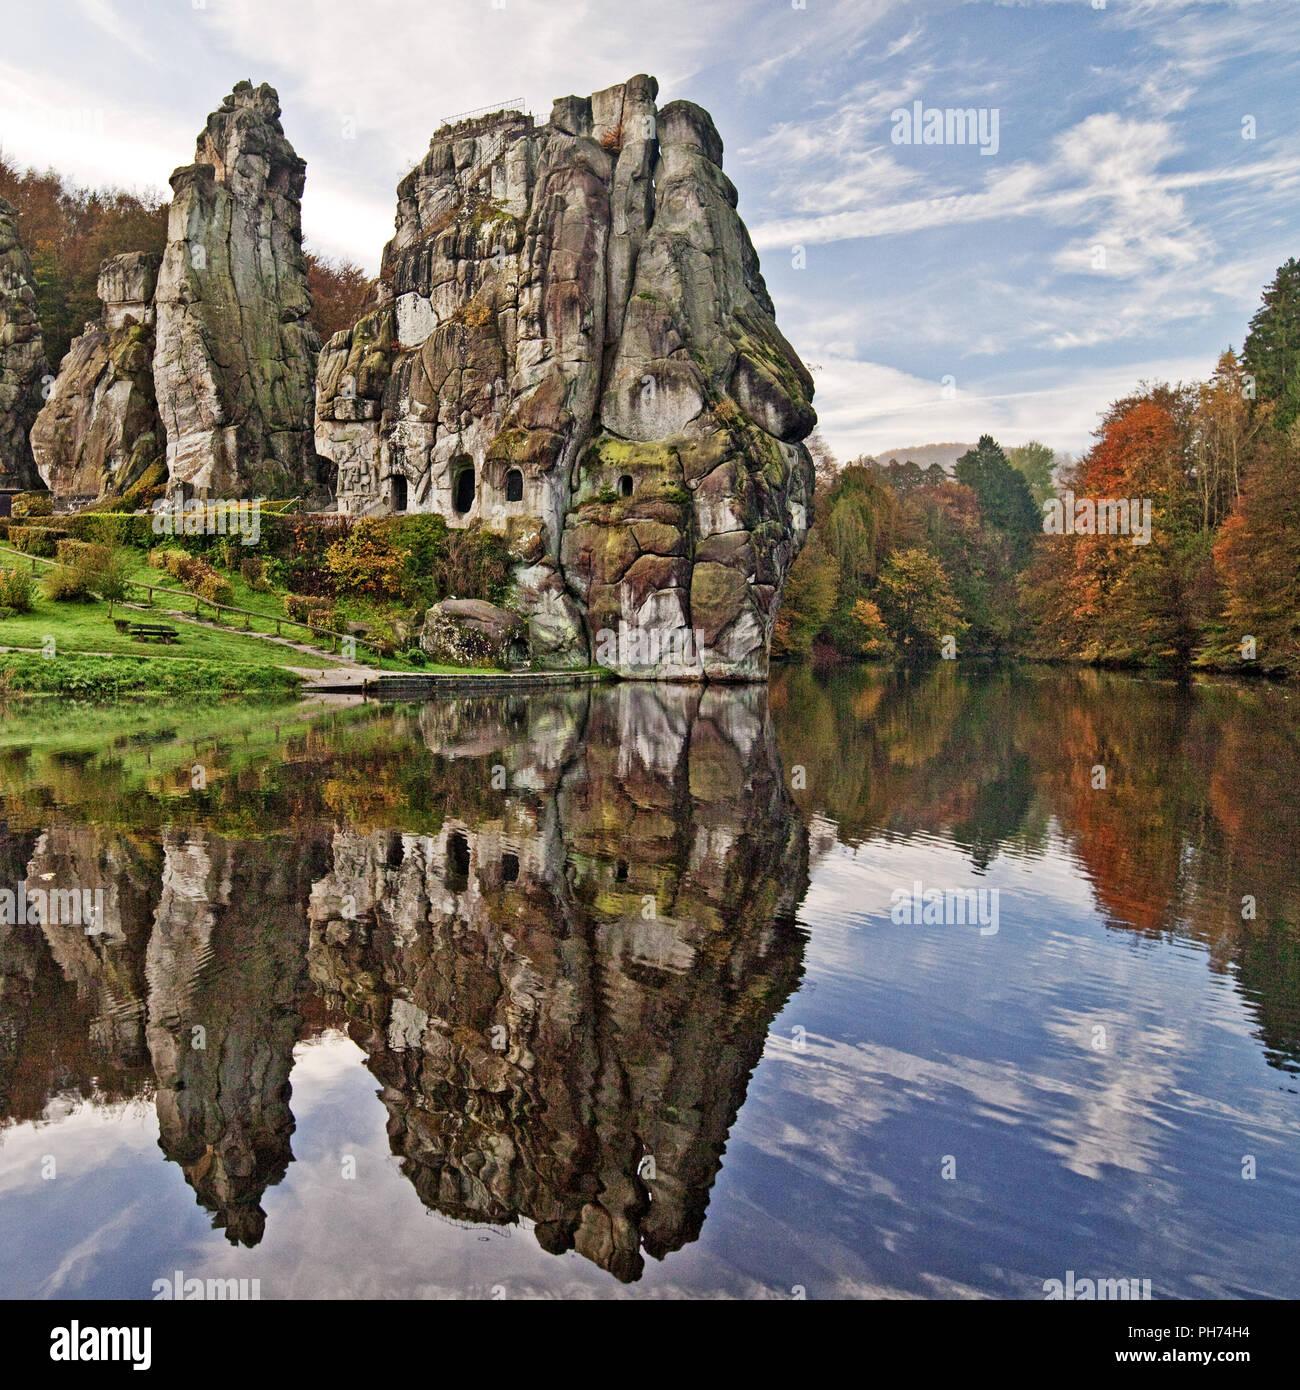 Externsteine, sandstone rock formations, Germany - Stock Image